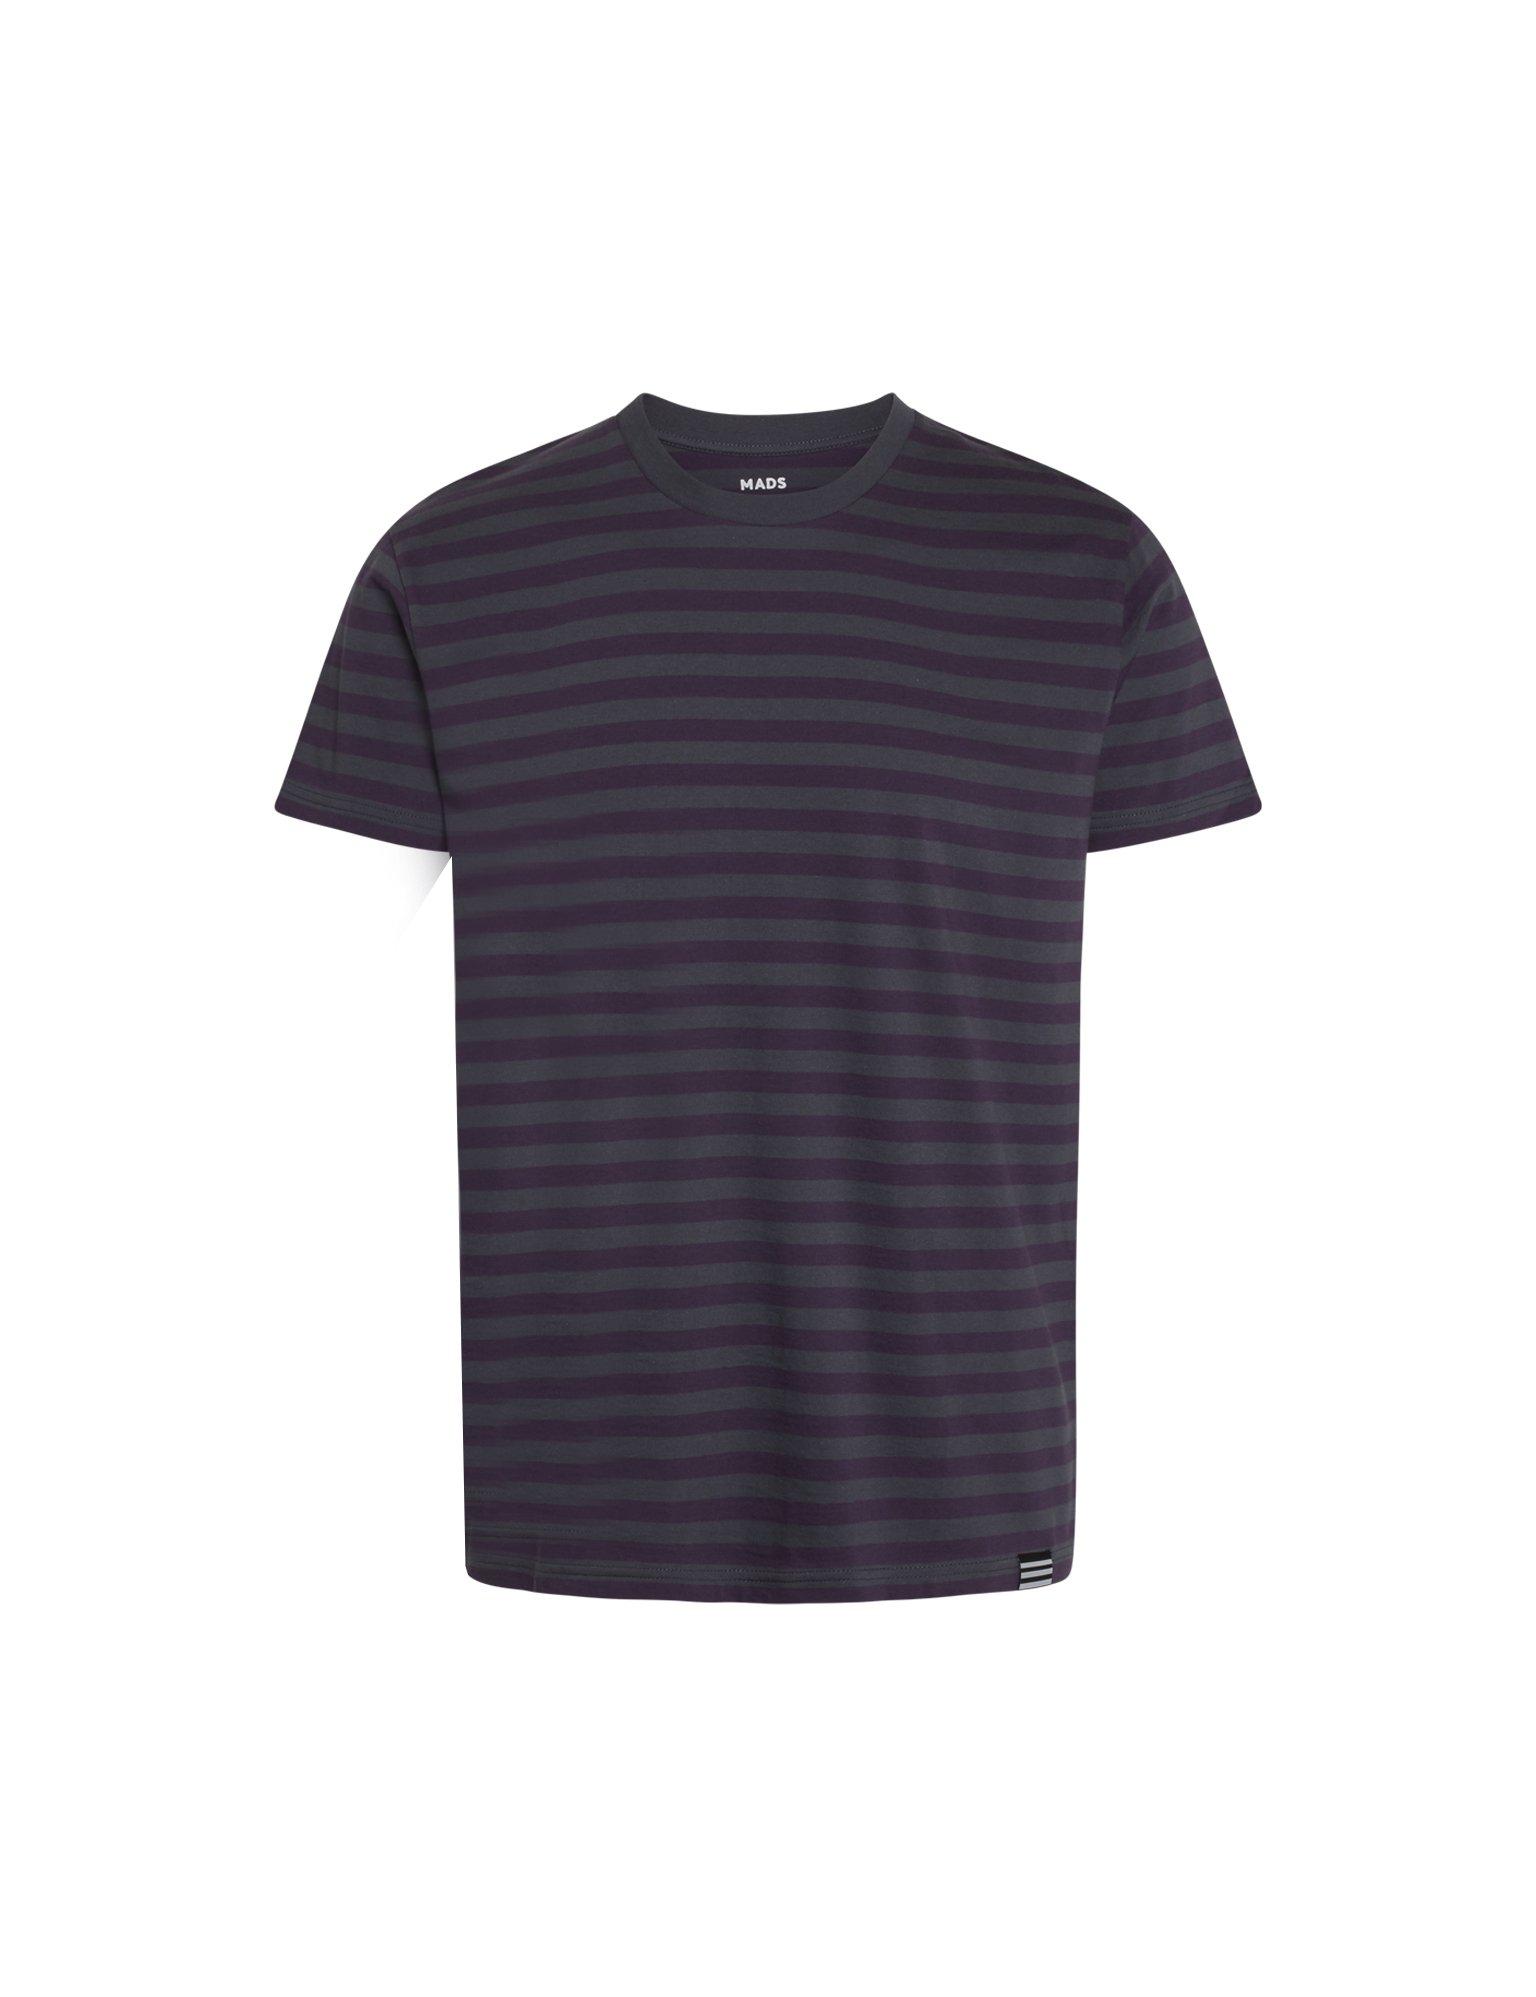 Mads Nørgaard Midi Thor t-shirt, ebony/nightshade, small